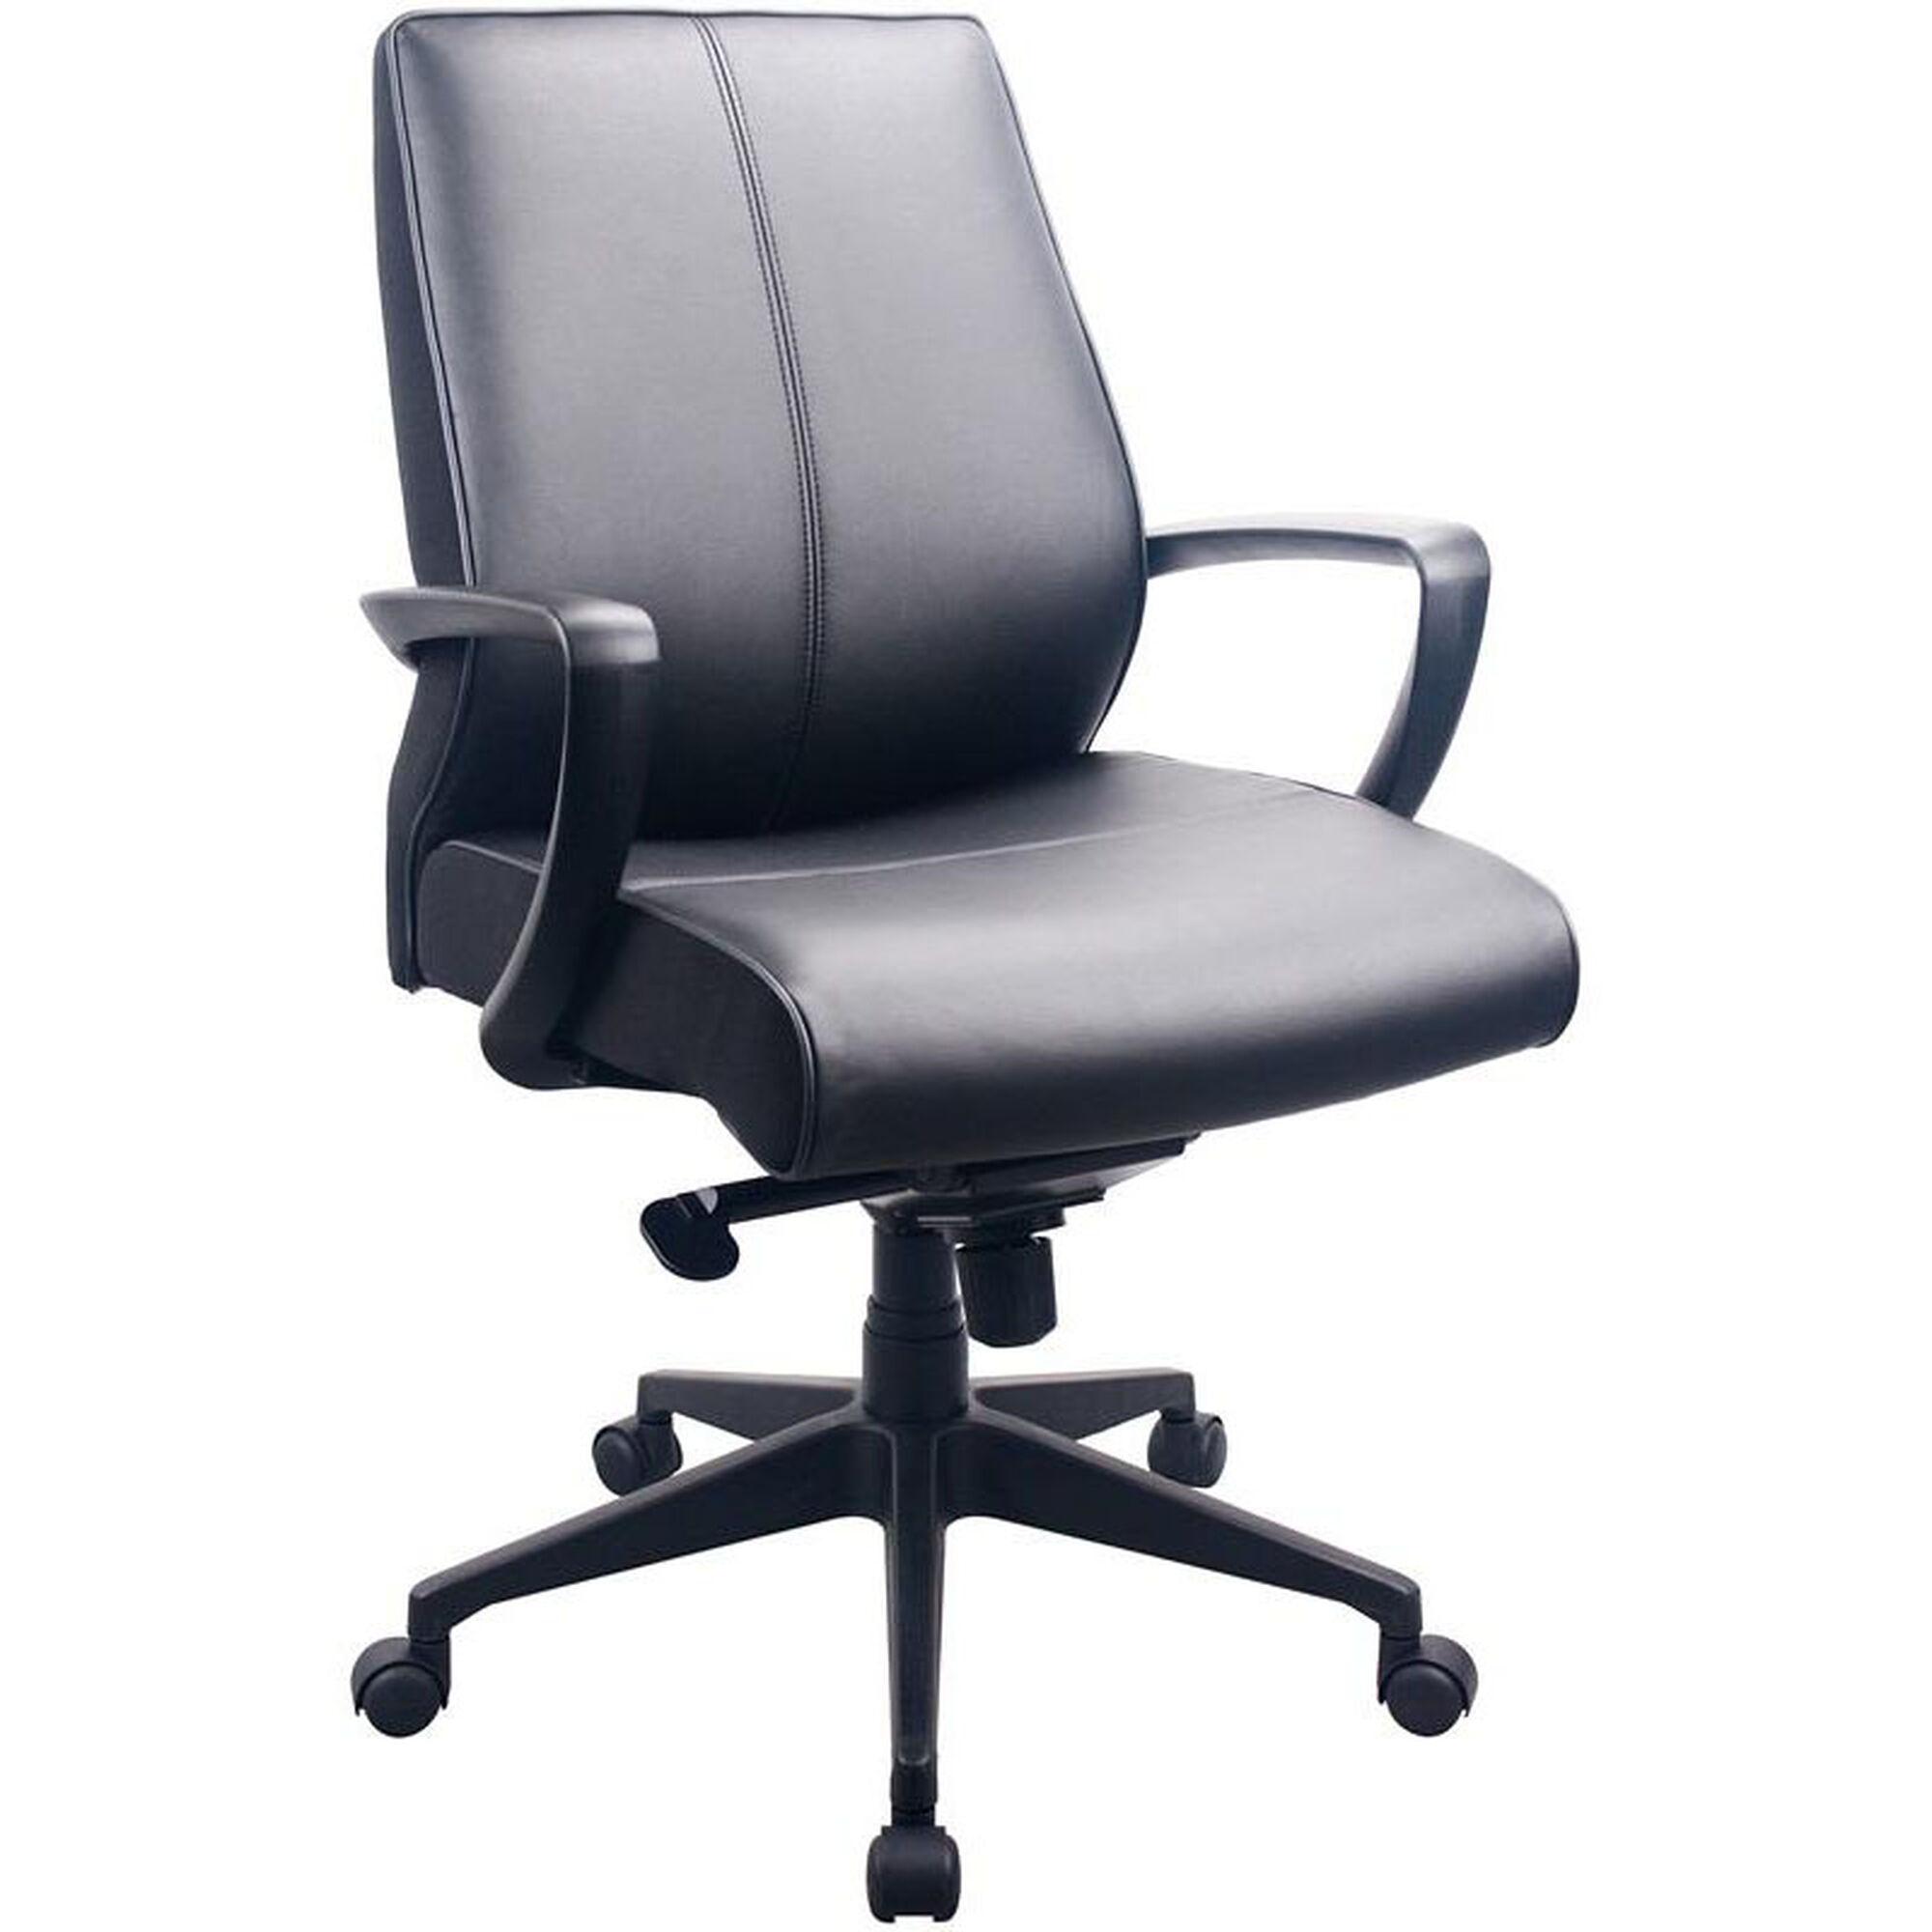 Magnificent Tempur Pedic Leather Mid Back Chair Black Spiritservingveterans Wood Chair Design Ideas Spiritservingveteransorg